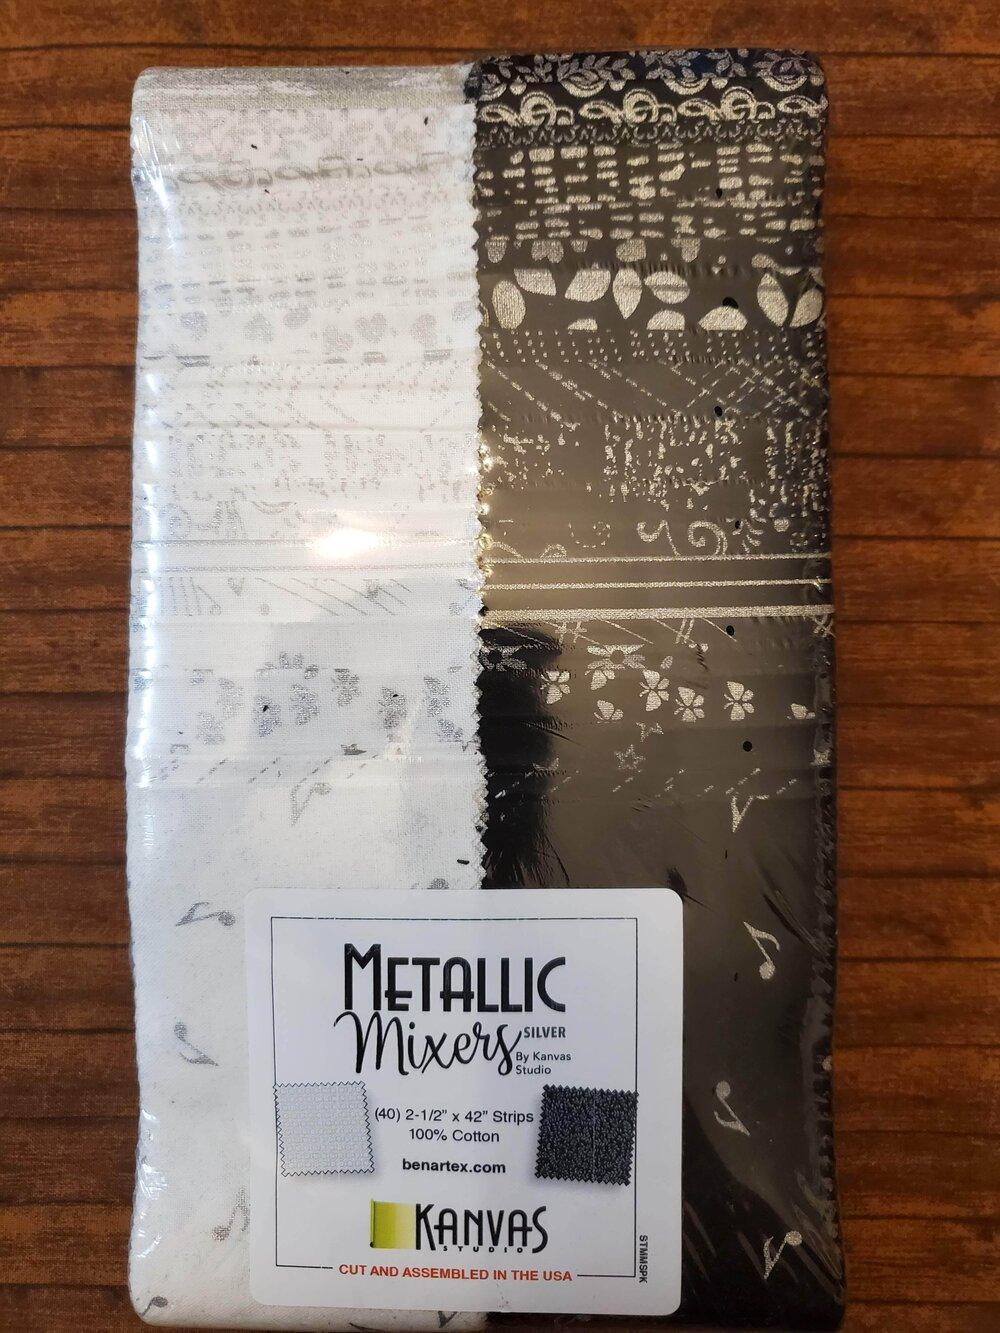 Metallic Mixers by Benartex - 2.5 Strips- 40 piece Fabric Strips Flat Pack